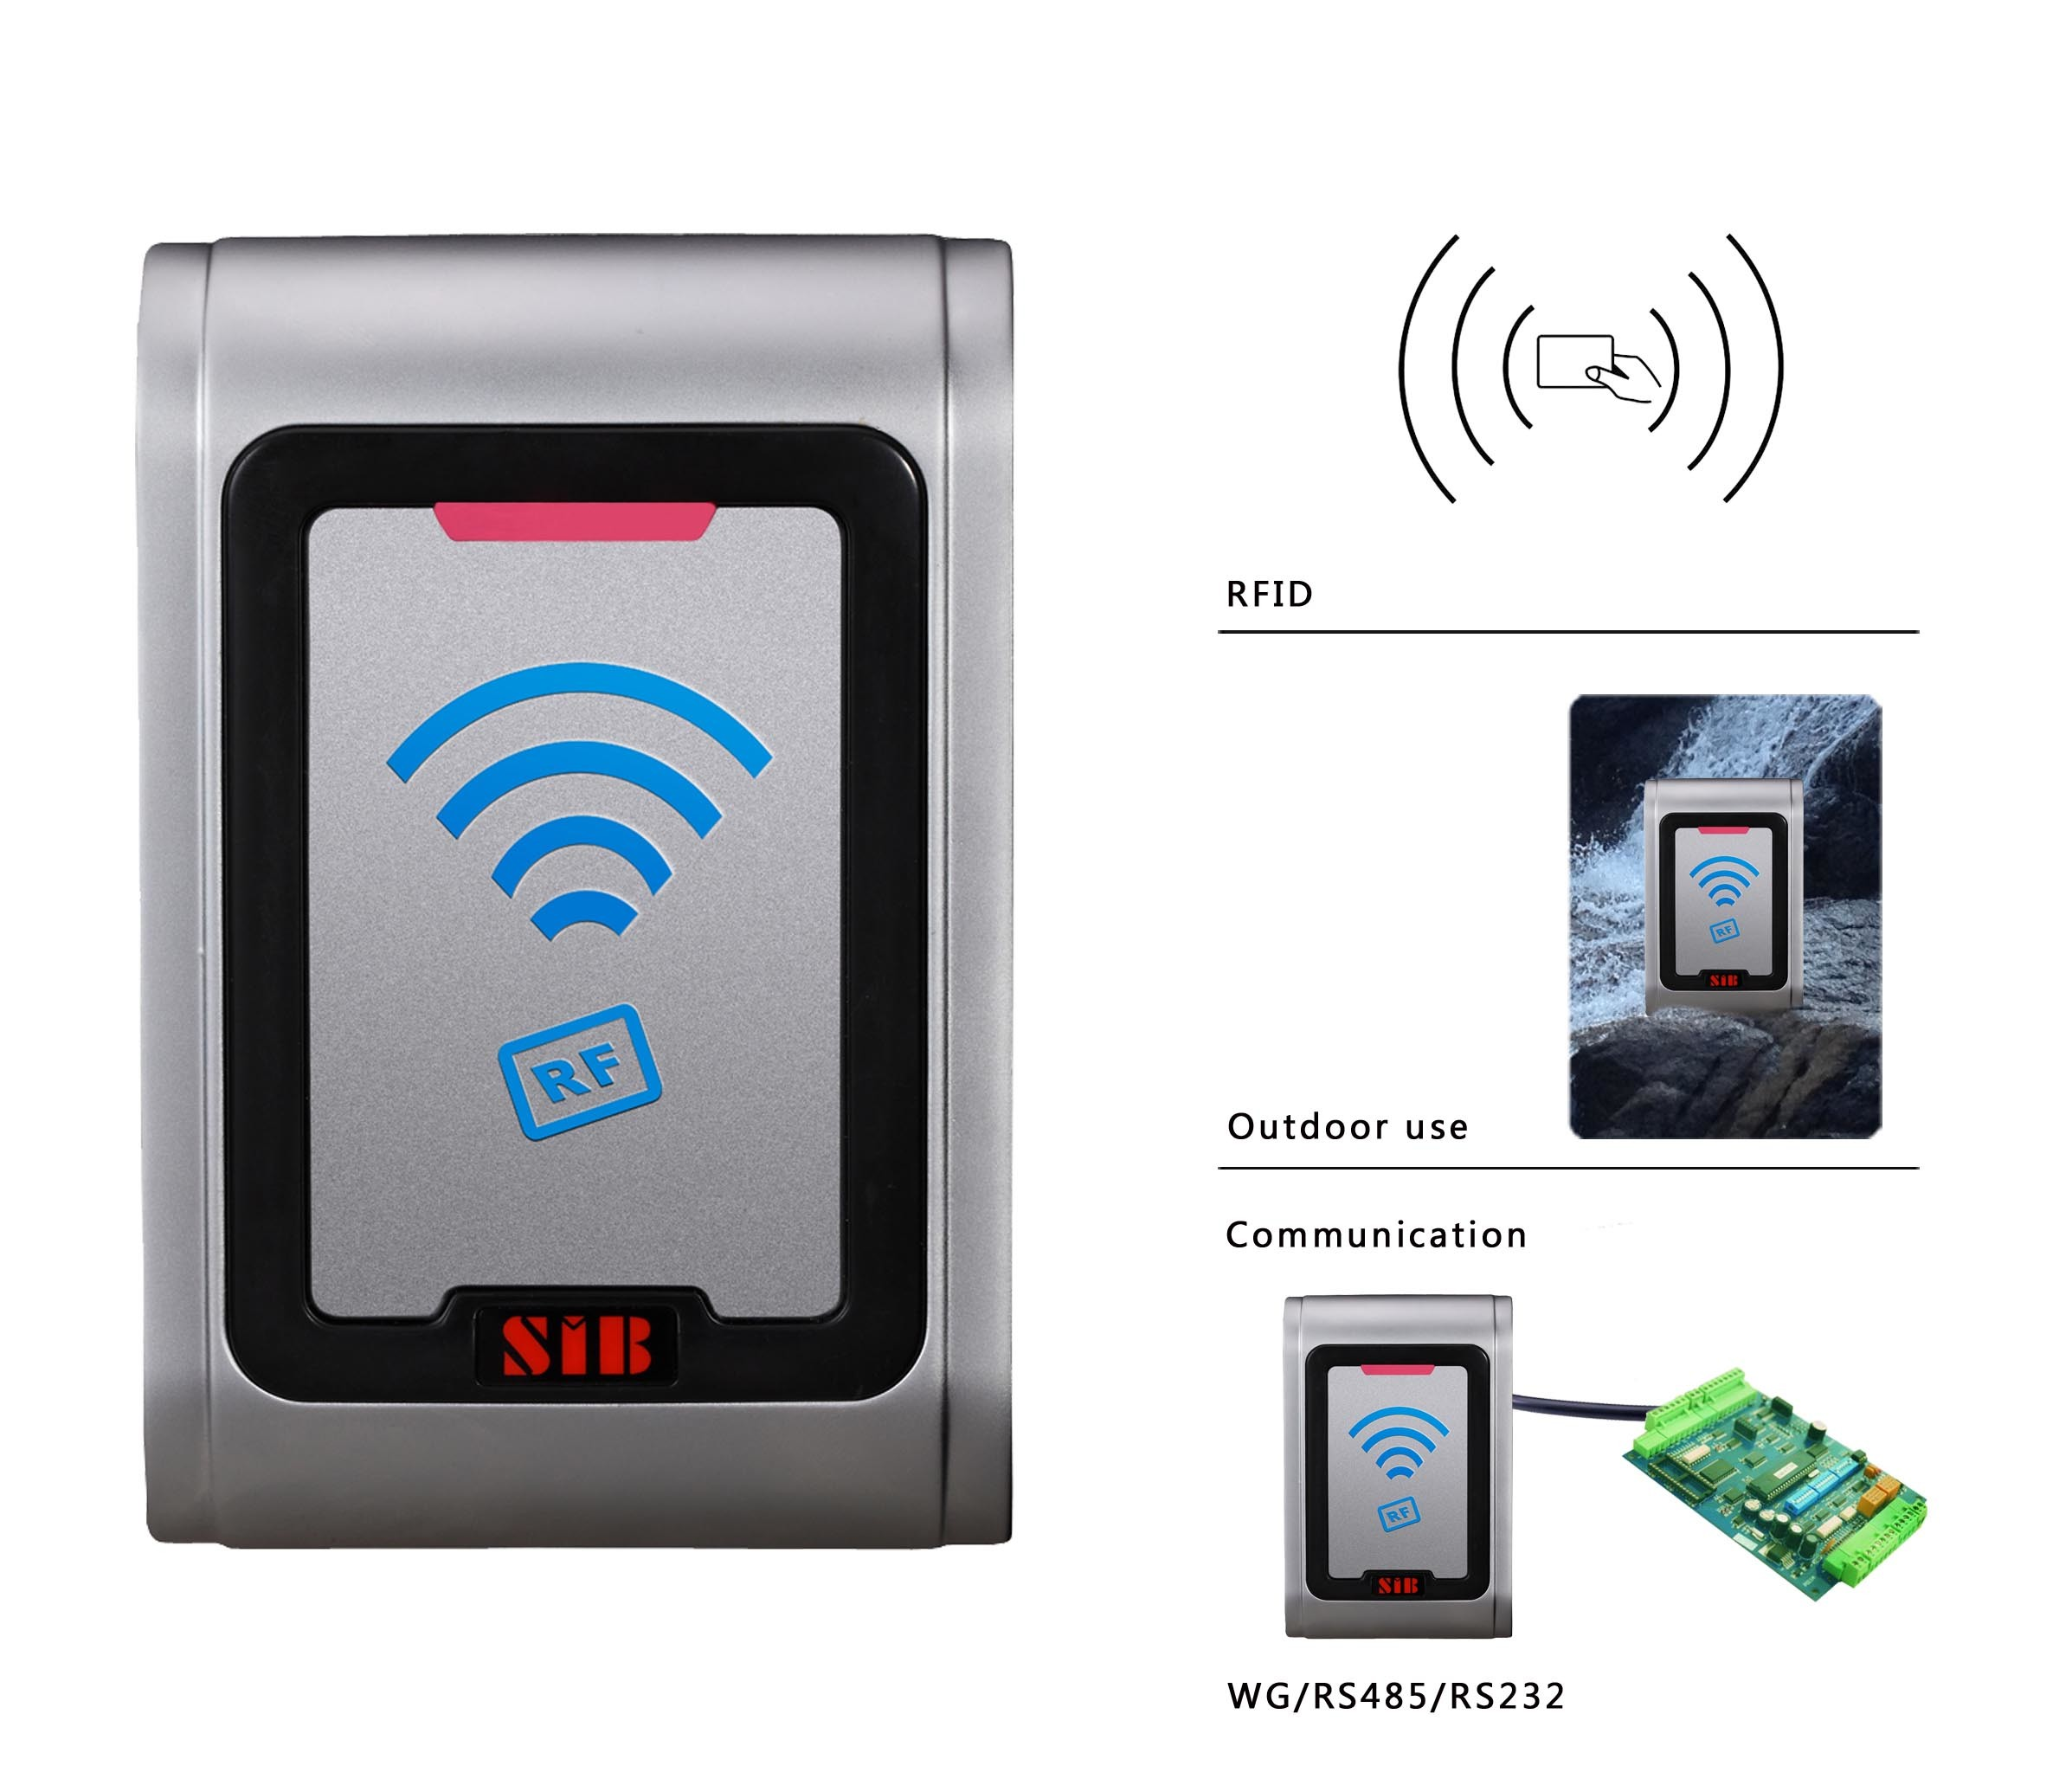 Metal Access Control RFID/Proximity Card Reader RF006em